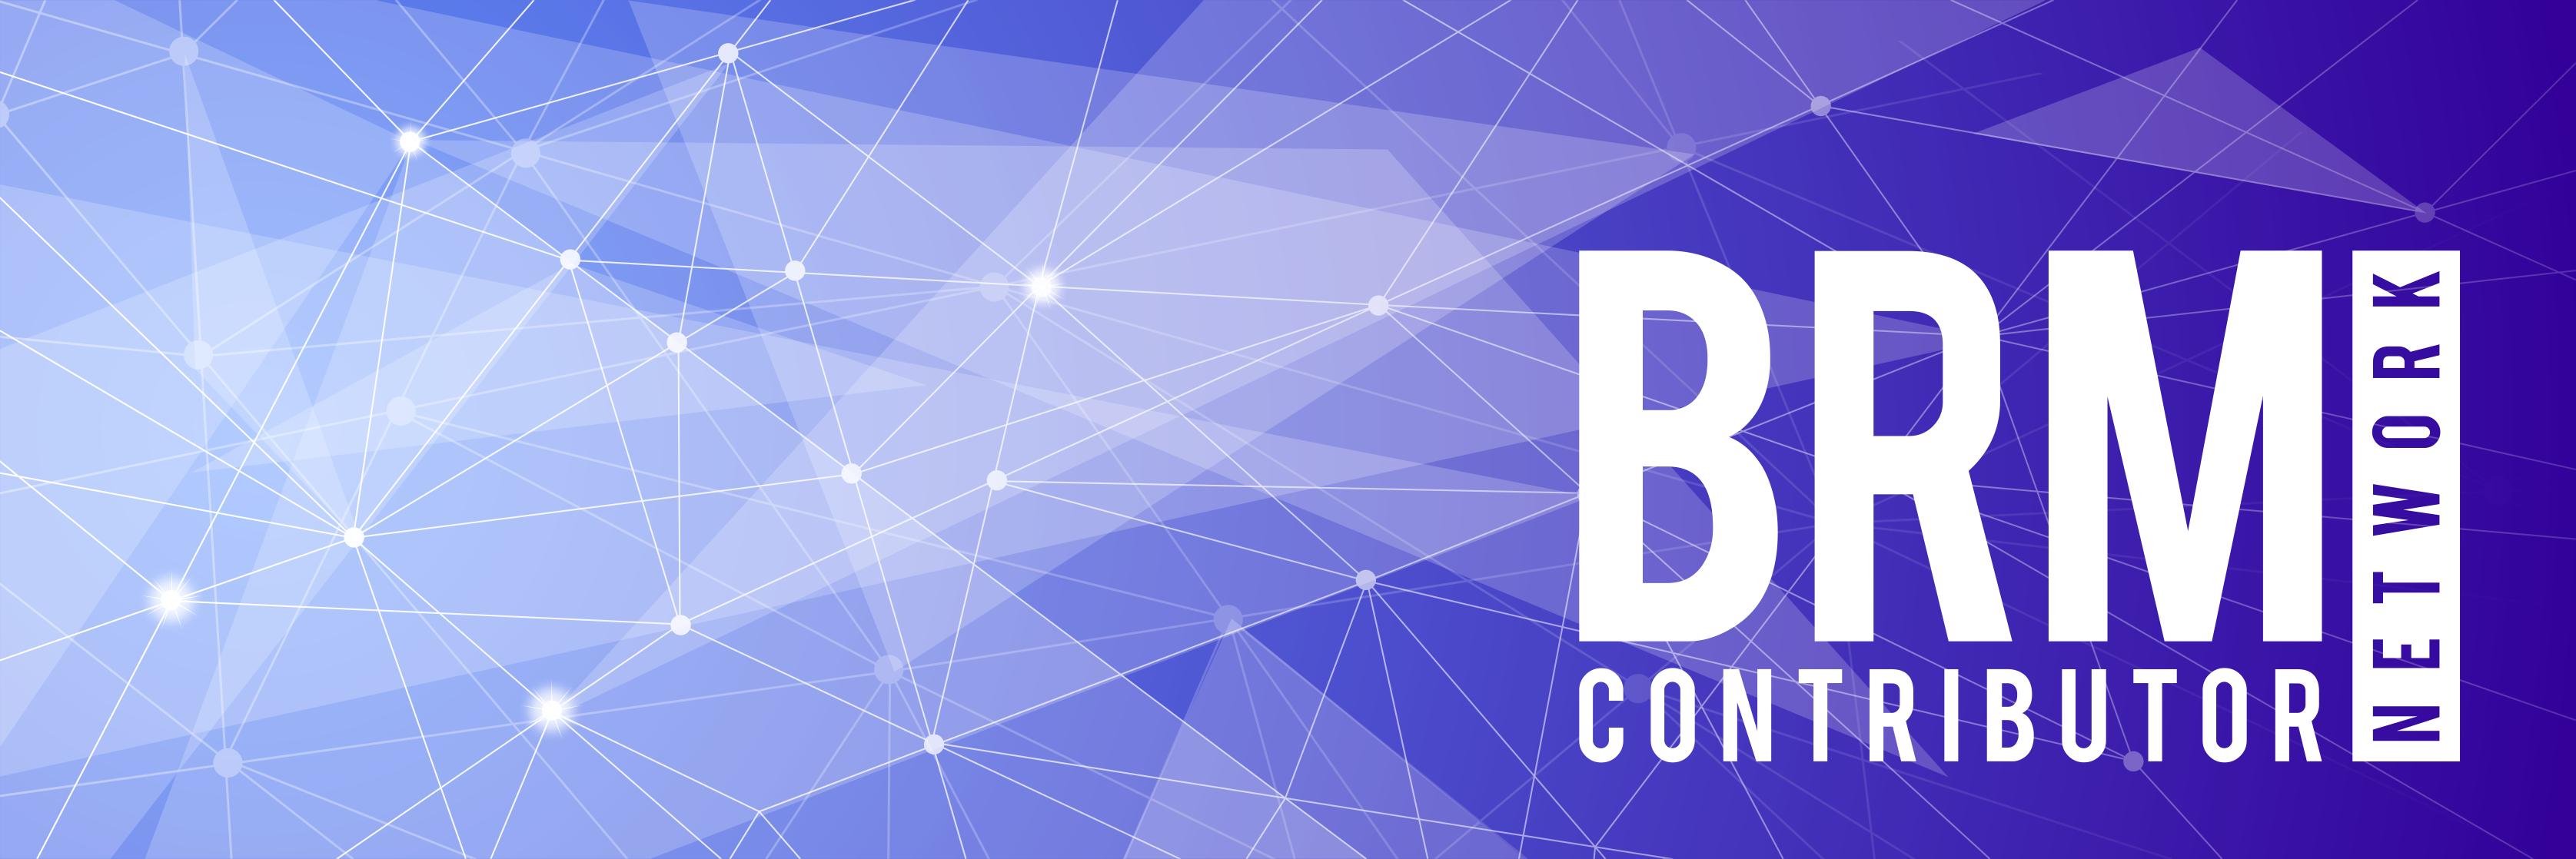 BRM_Con_Net_EmailHead_01